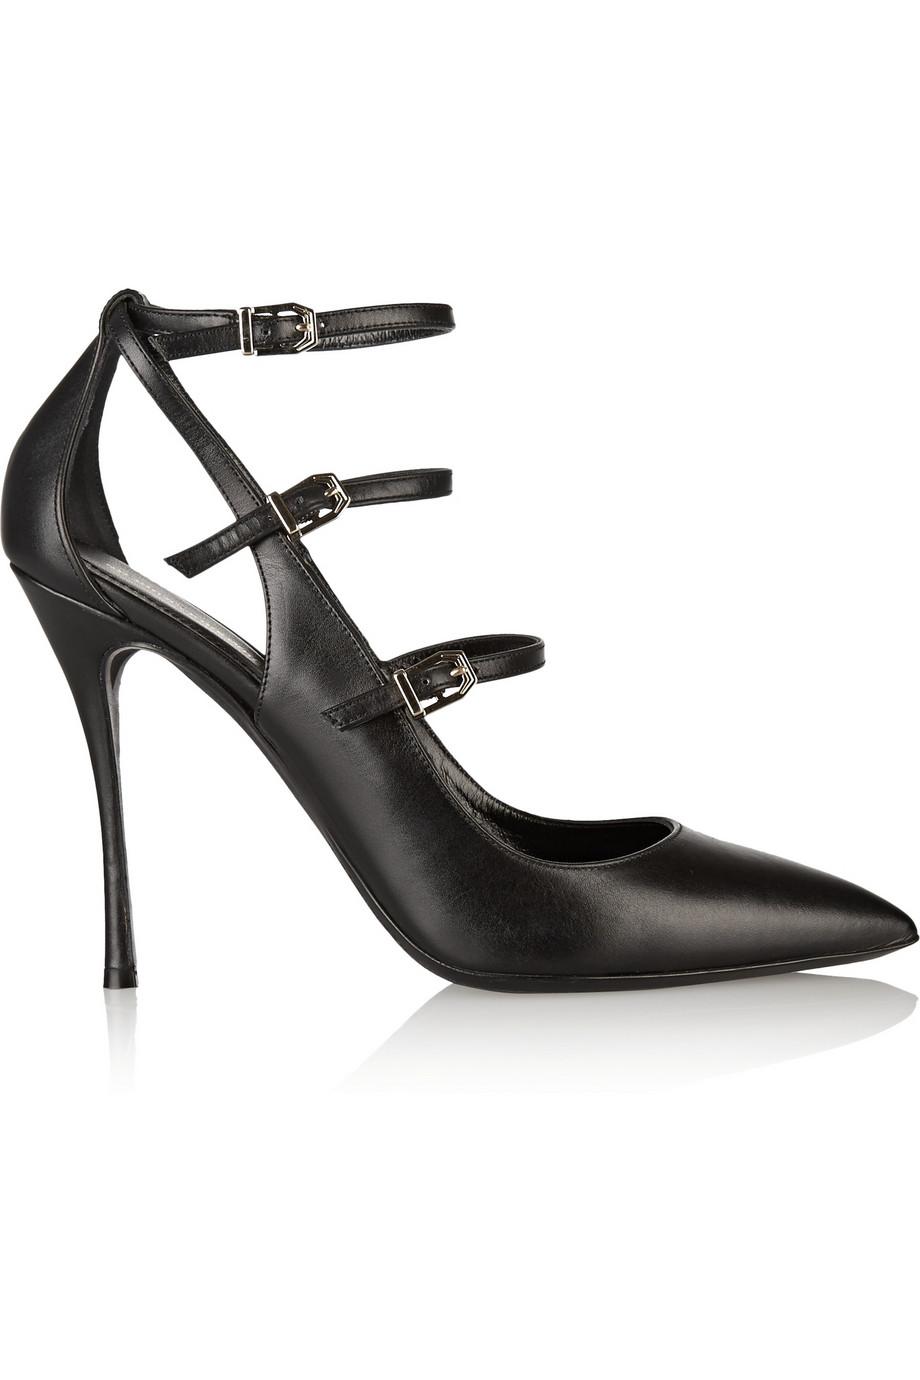 NICHOLAS KIRKWOOD Black Multi Strap Leather Heels at THE OUTNET.COM